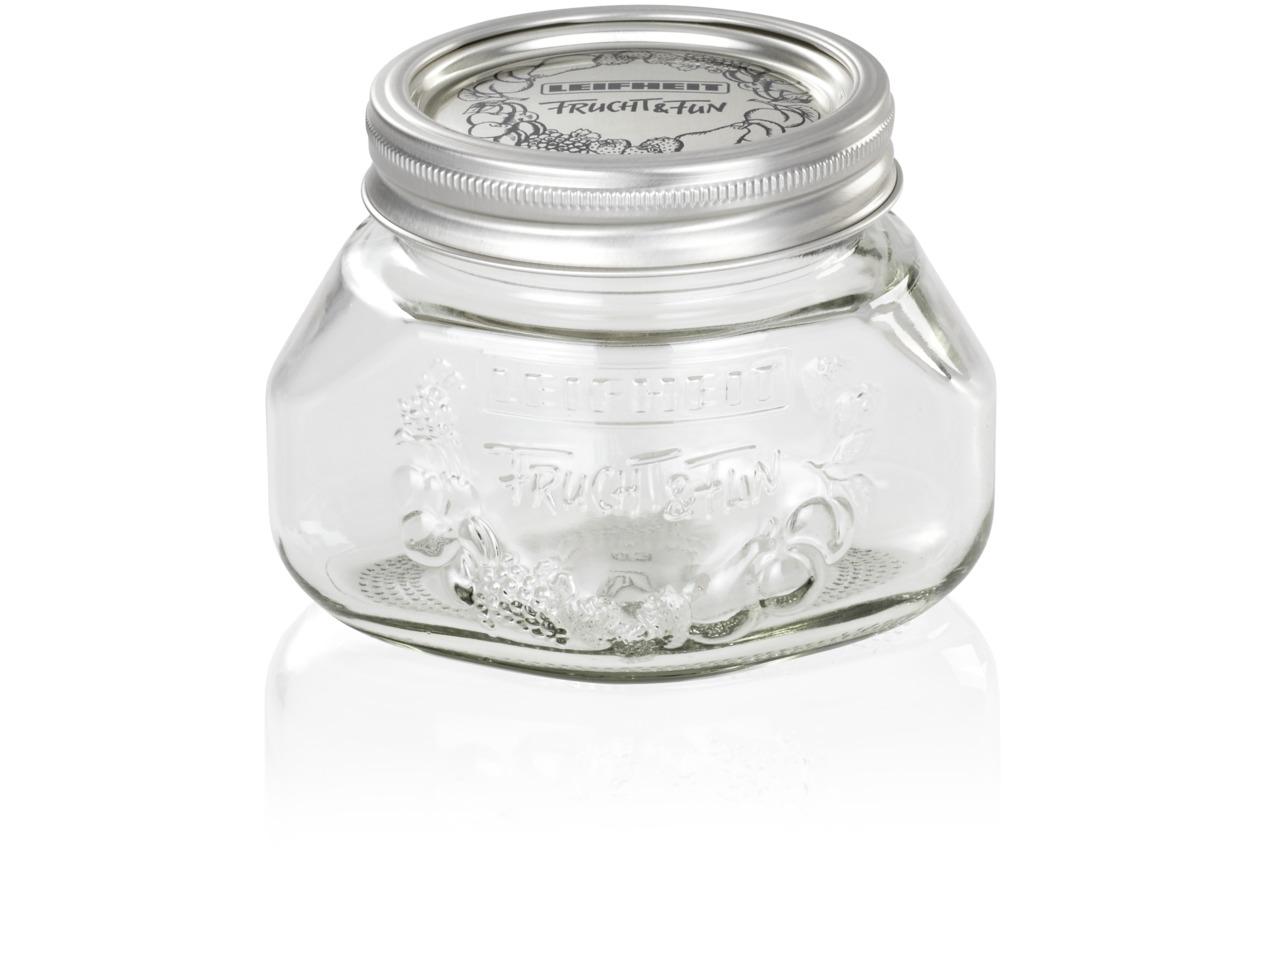 LEIFHEIT 36103 PRESERVING JAR 0,5 L